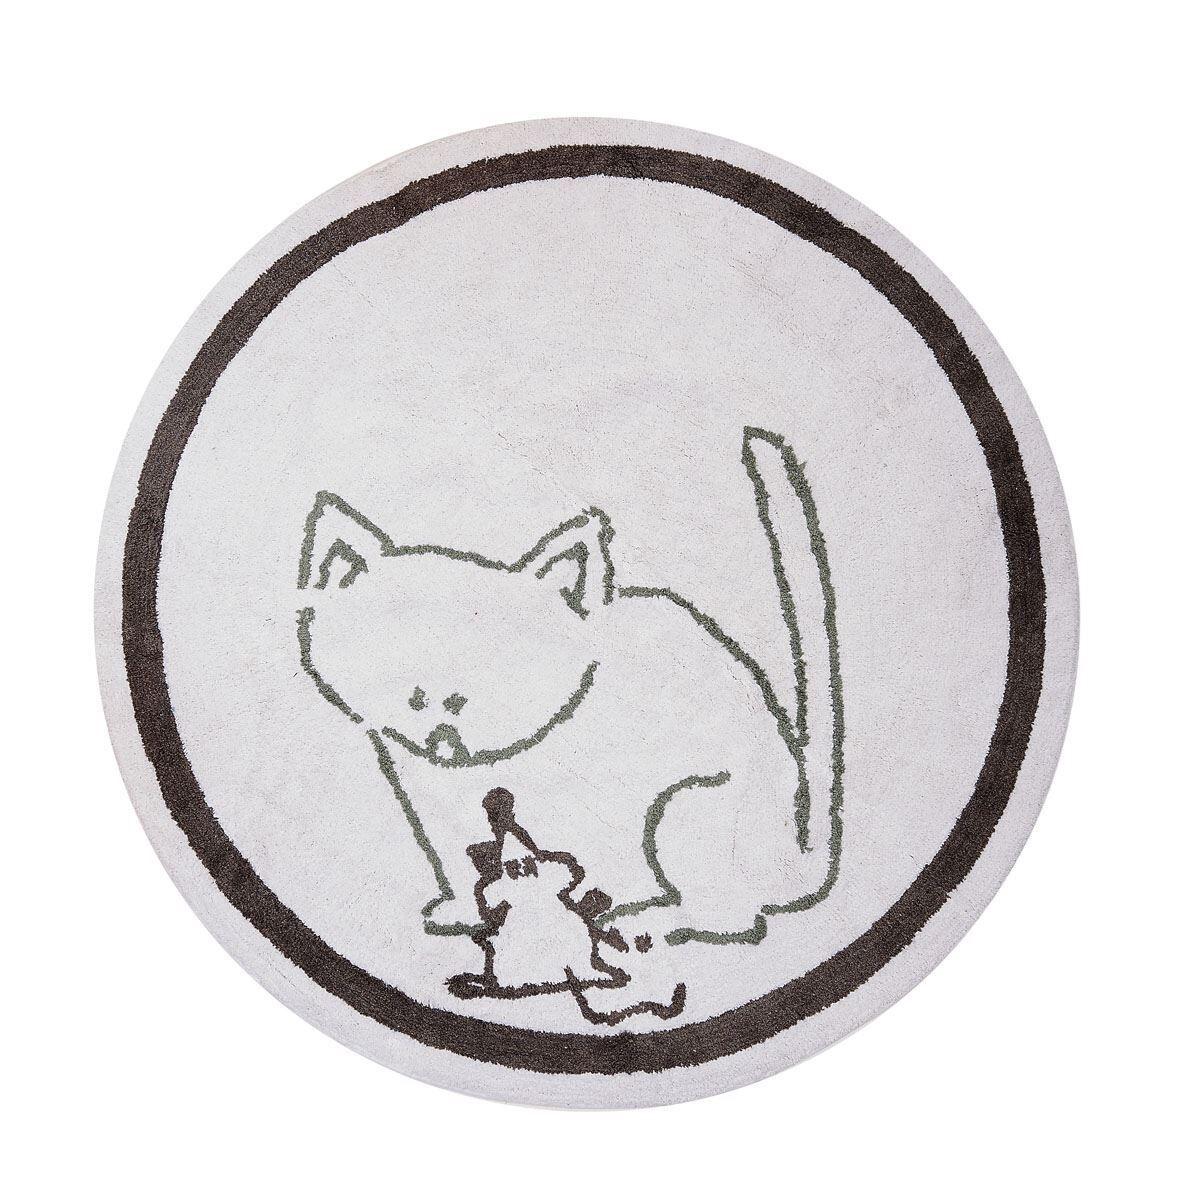 Aratex Gulvteppe, Animalitos, Katt